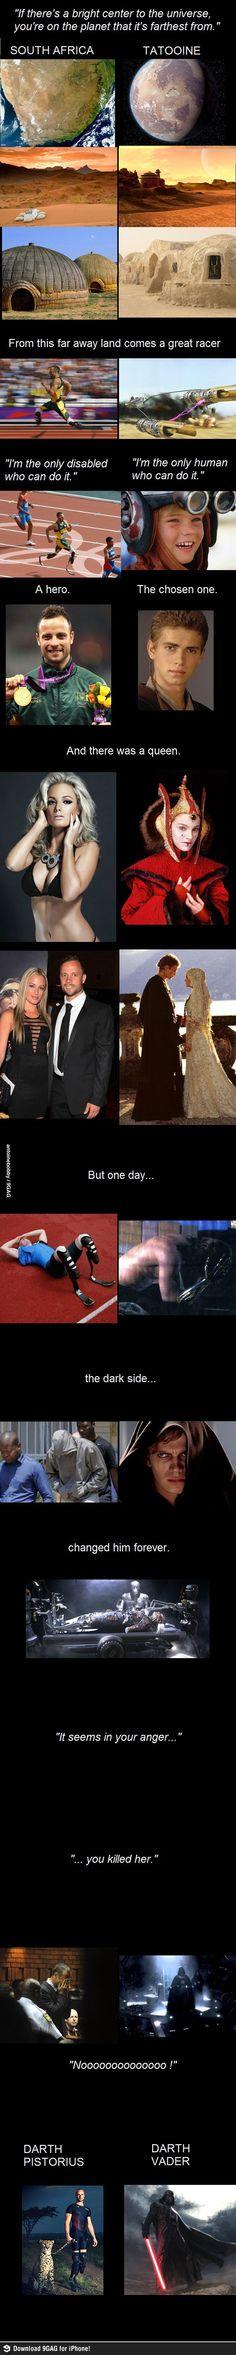 Darth Pistorius, the story of Oscar and Anakin